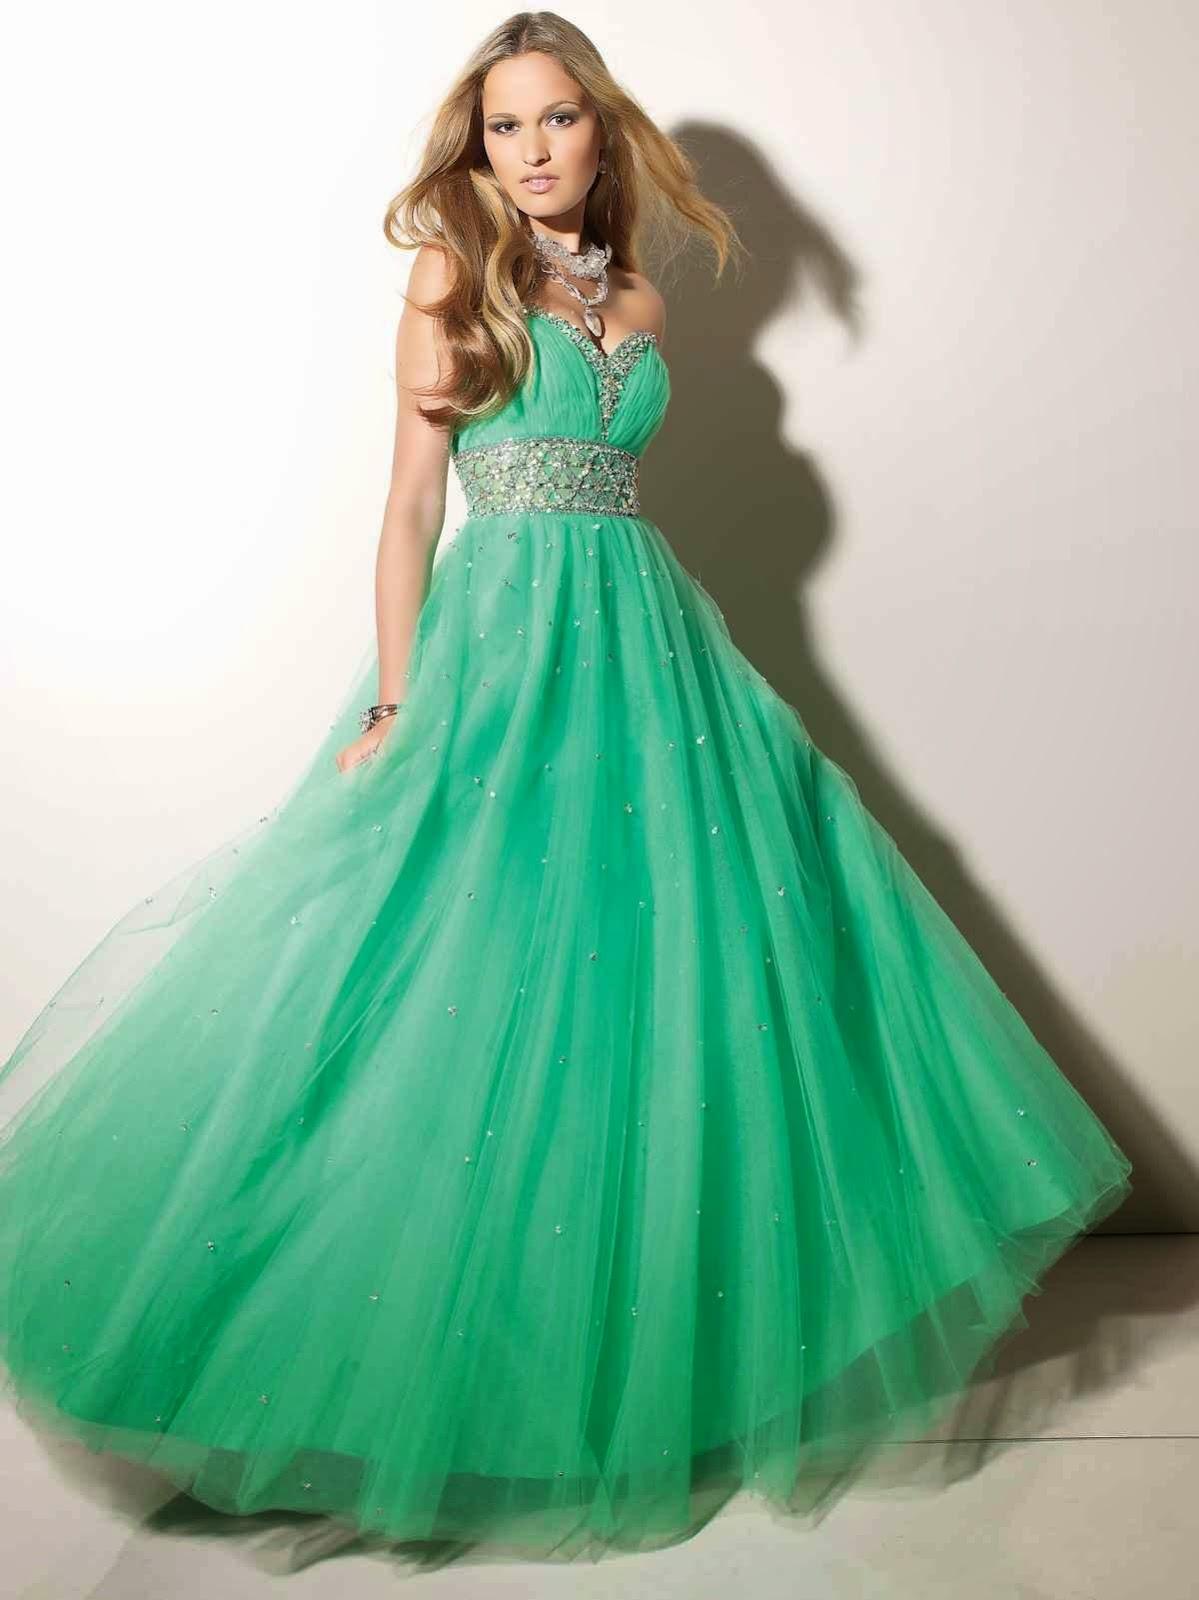 Disenos de vestidos para fiesta de egresados